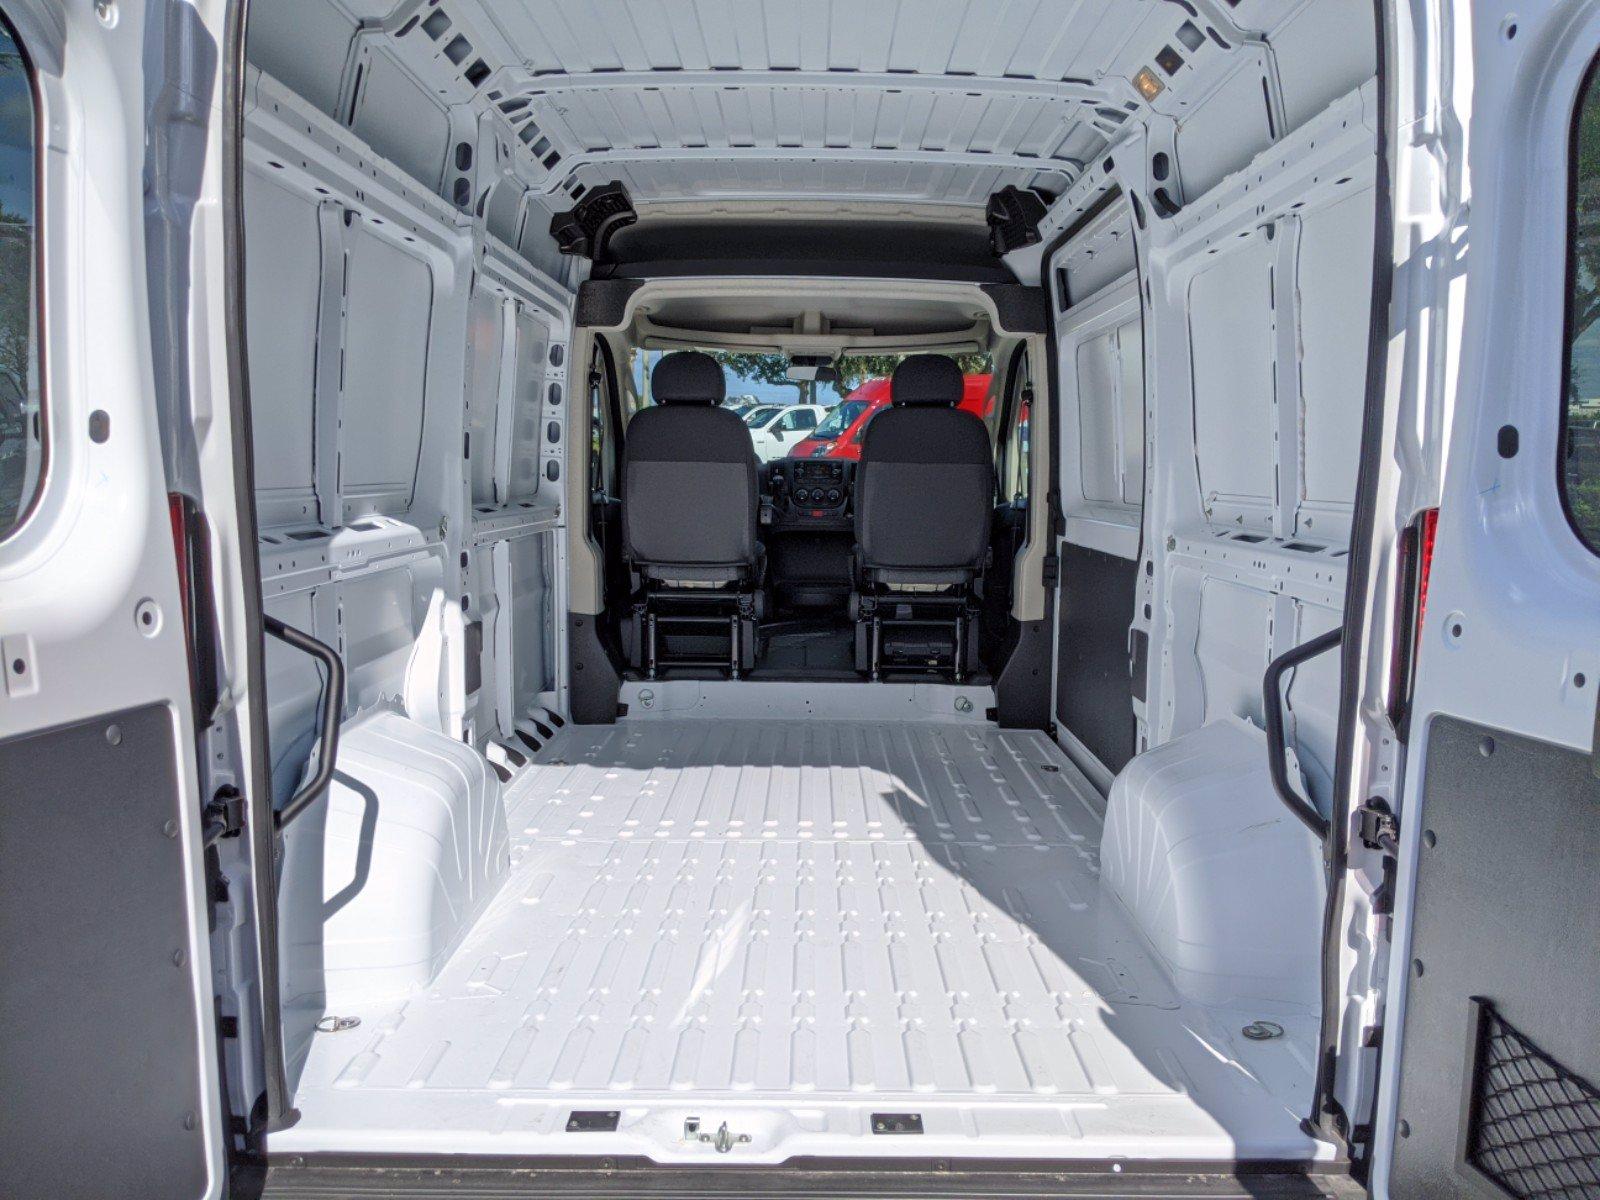 2020 Ram ProMaster 2500 High Roof FWD, Empty Cargo Van #R20385 - photo 1